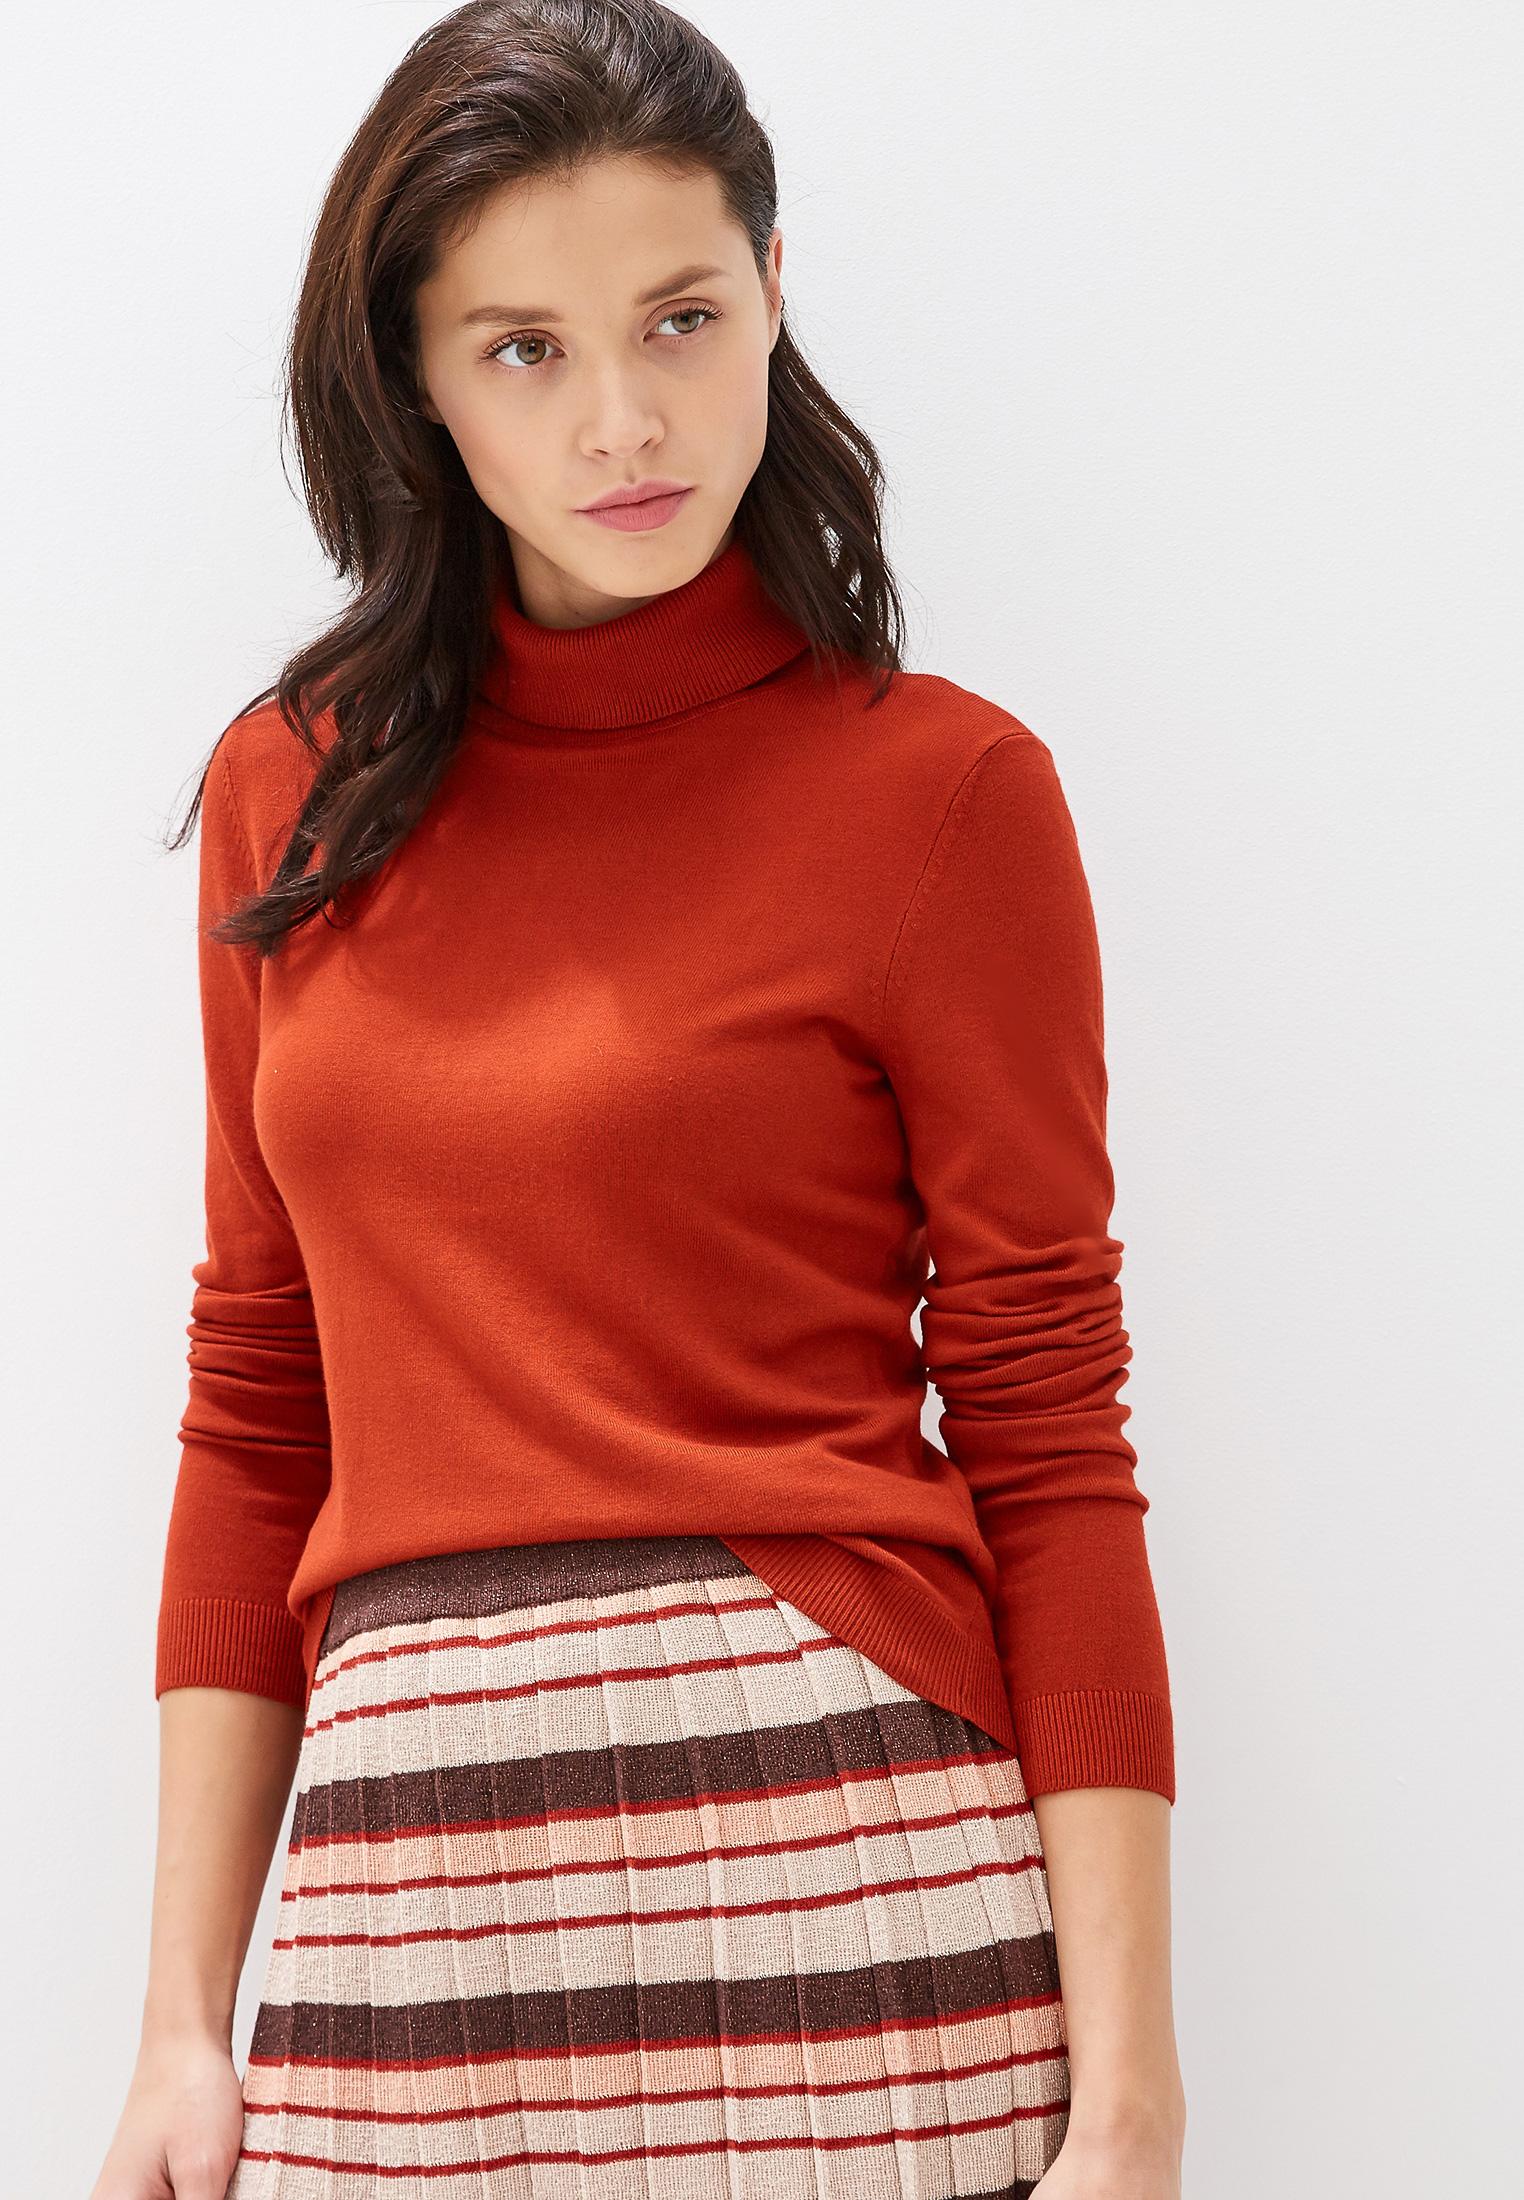 Водолазка, Vila, цвет: красный. Артикул: VI004EWFKYB7. Одежда / Джемперы, свитеры и кардиганы